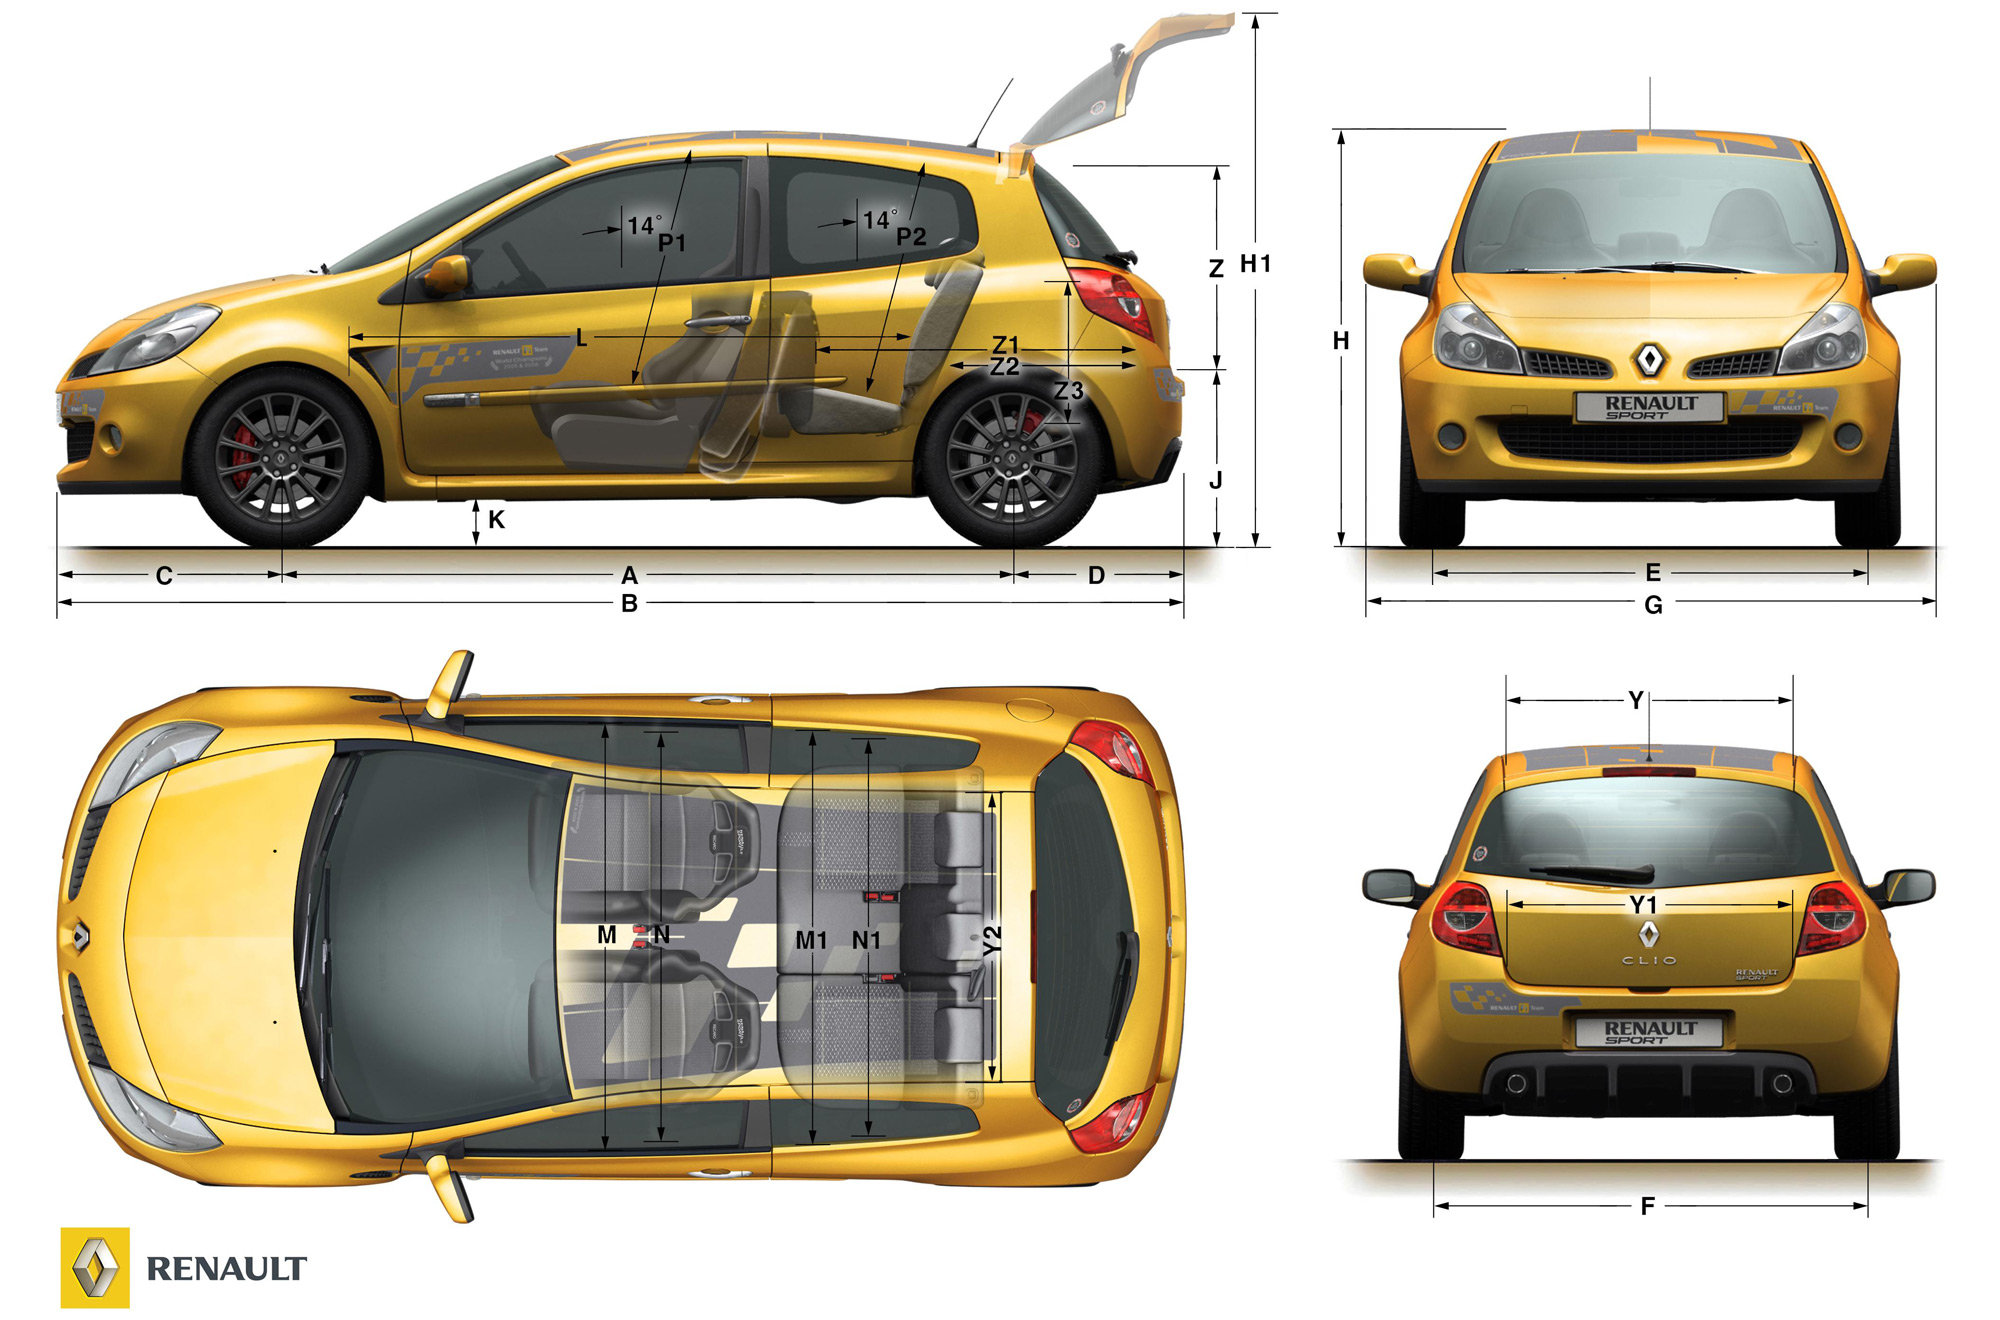 Renault Clio Renault Sport F1 R27 Technical Details